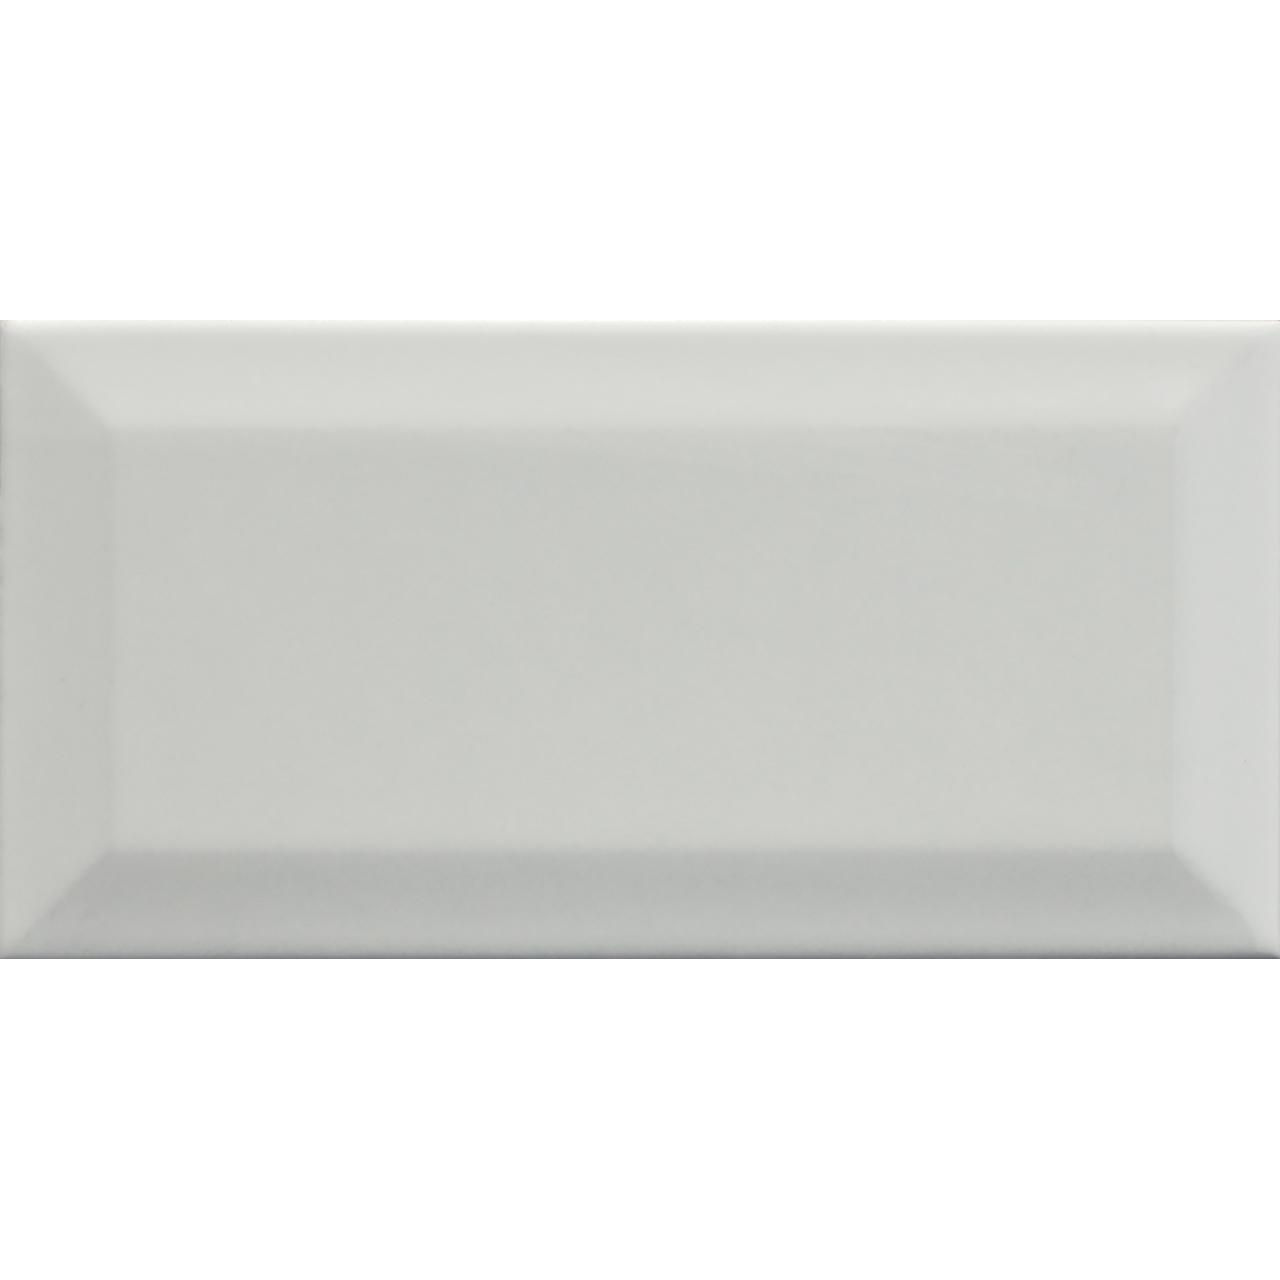 Wholesale Domestic Metro Bevelled White 10x20 Ceramic Tile